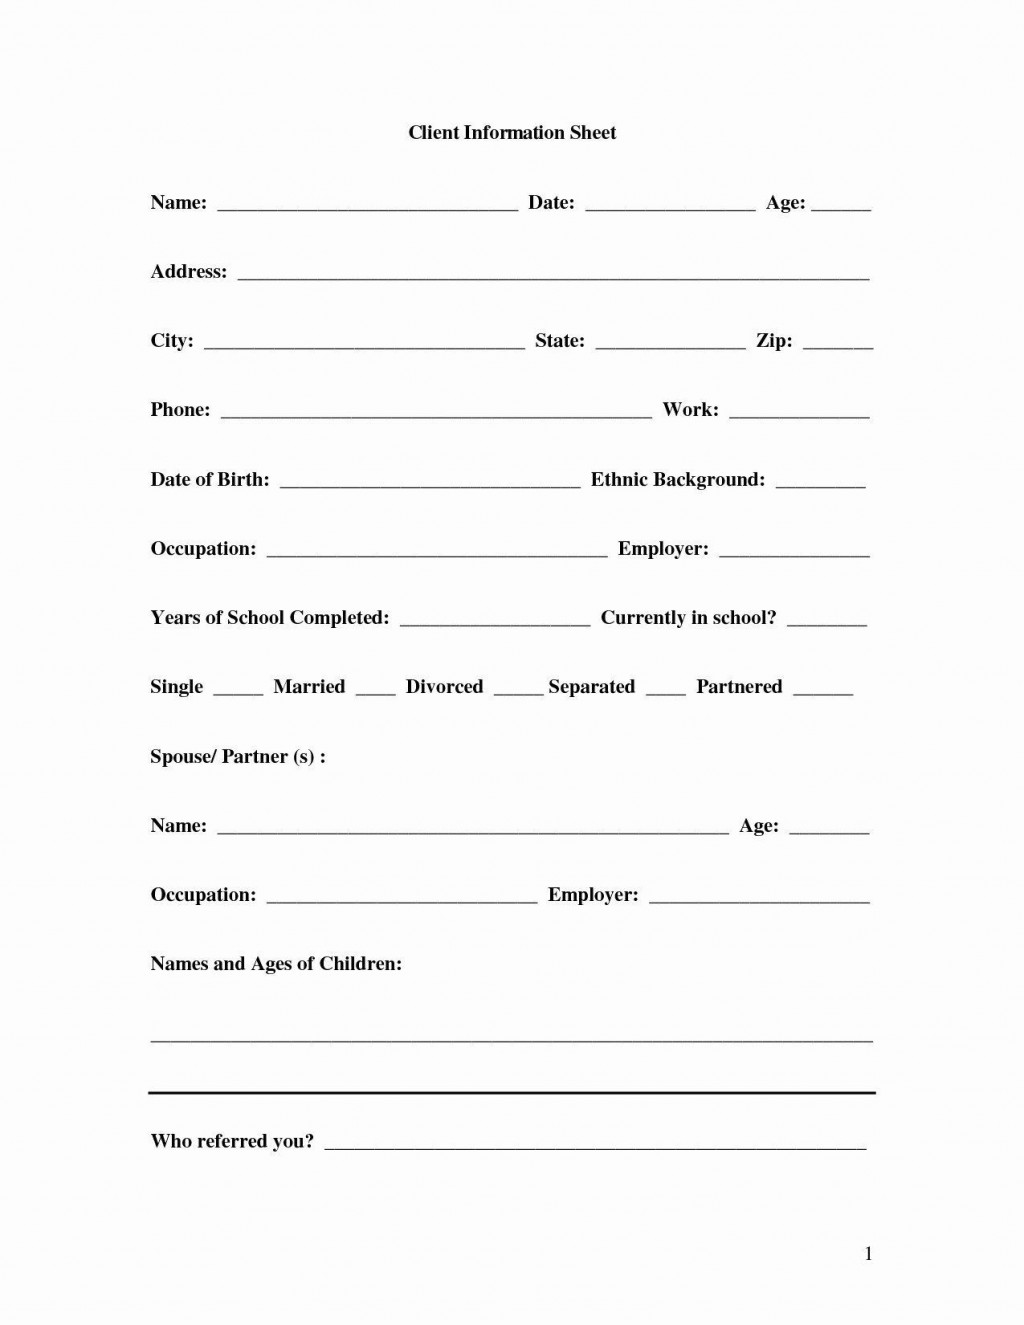 004 Unusual New Customer Form Template Word Photo  Registration Account FeedbackLarge